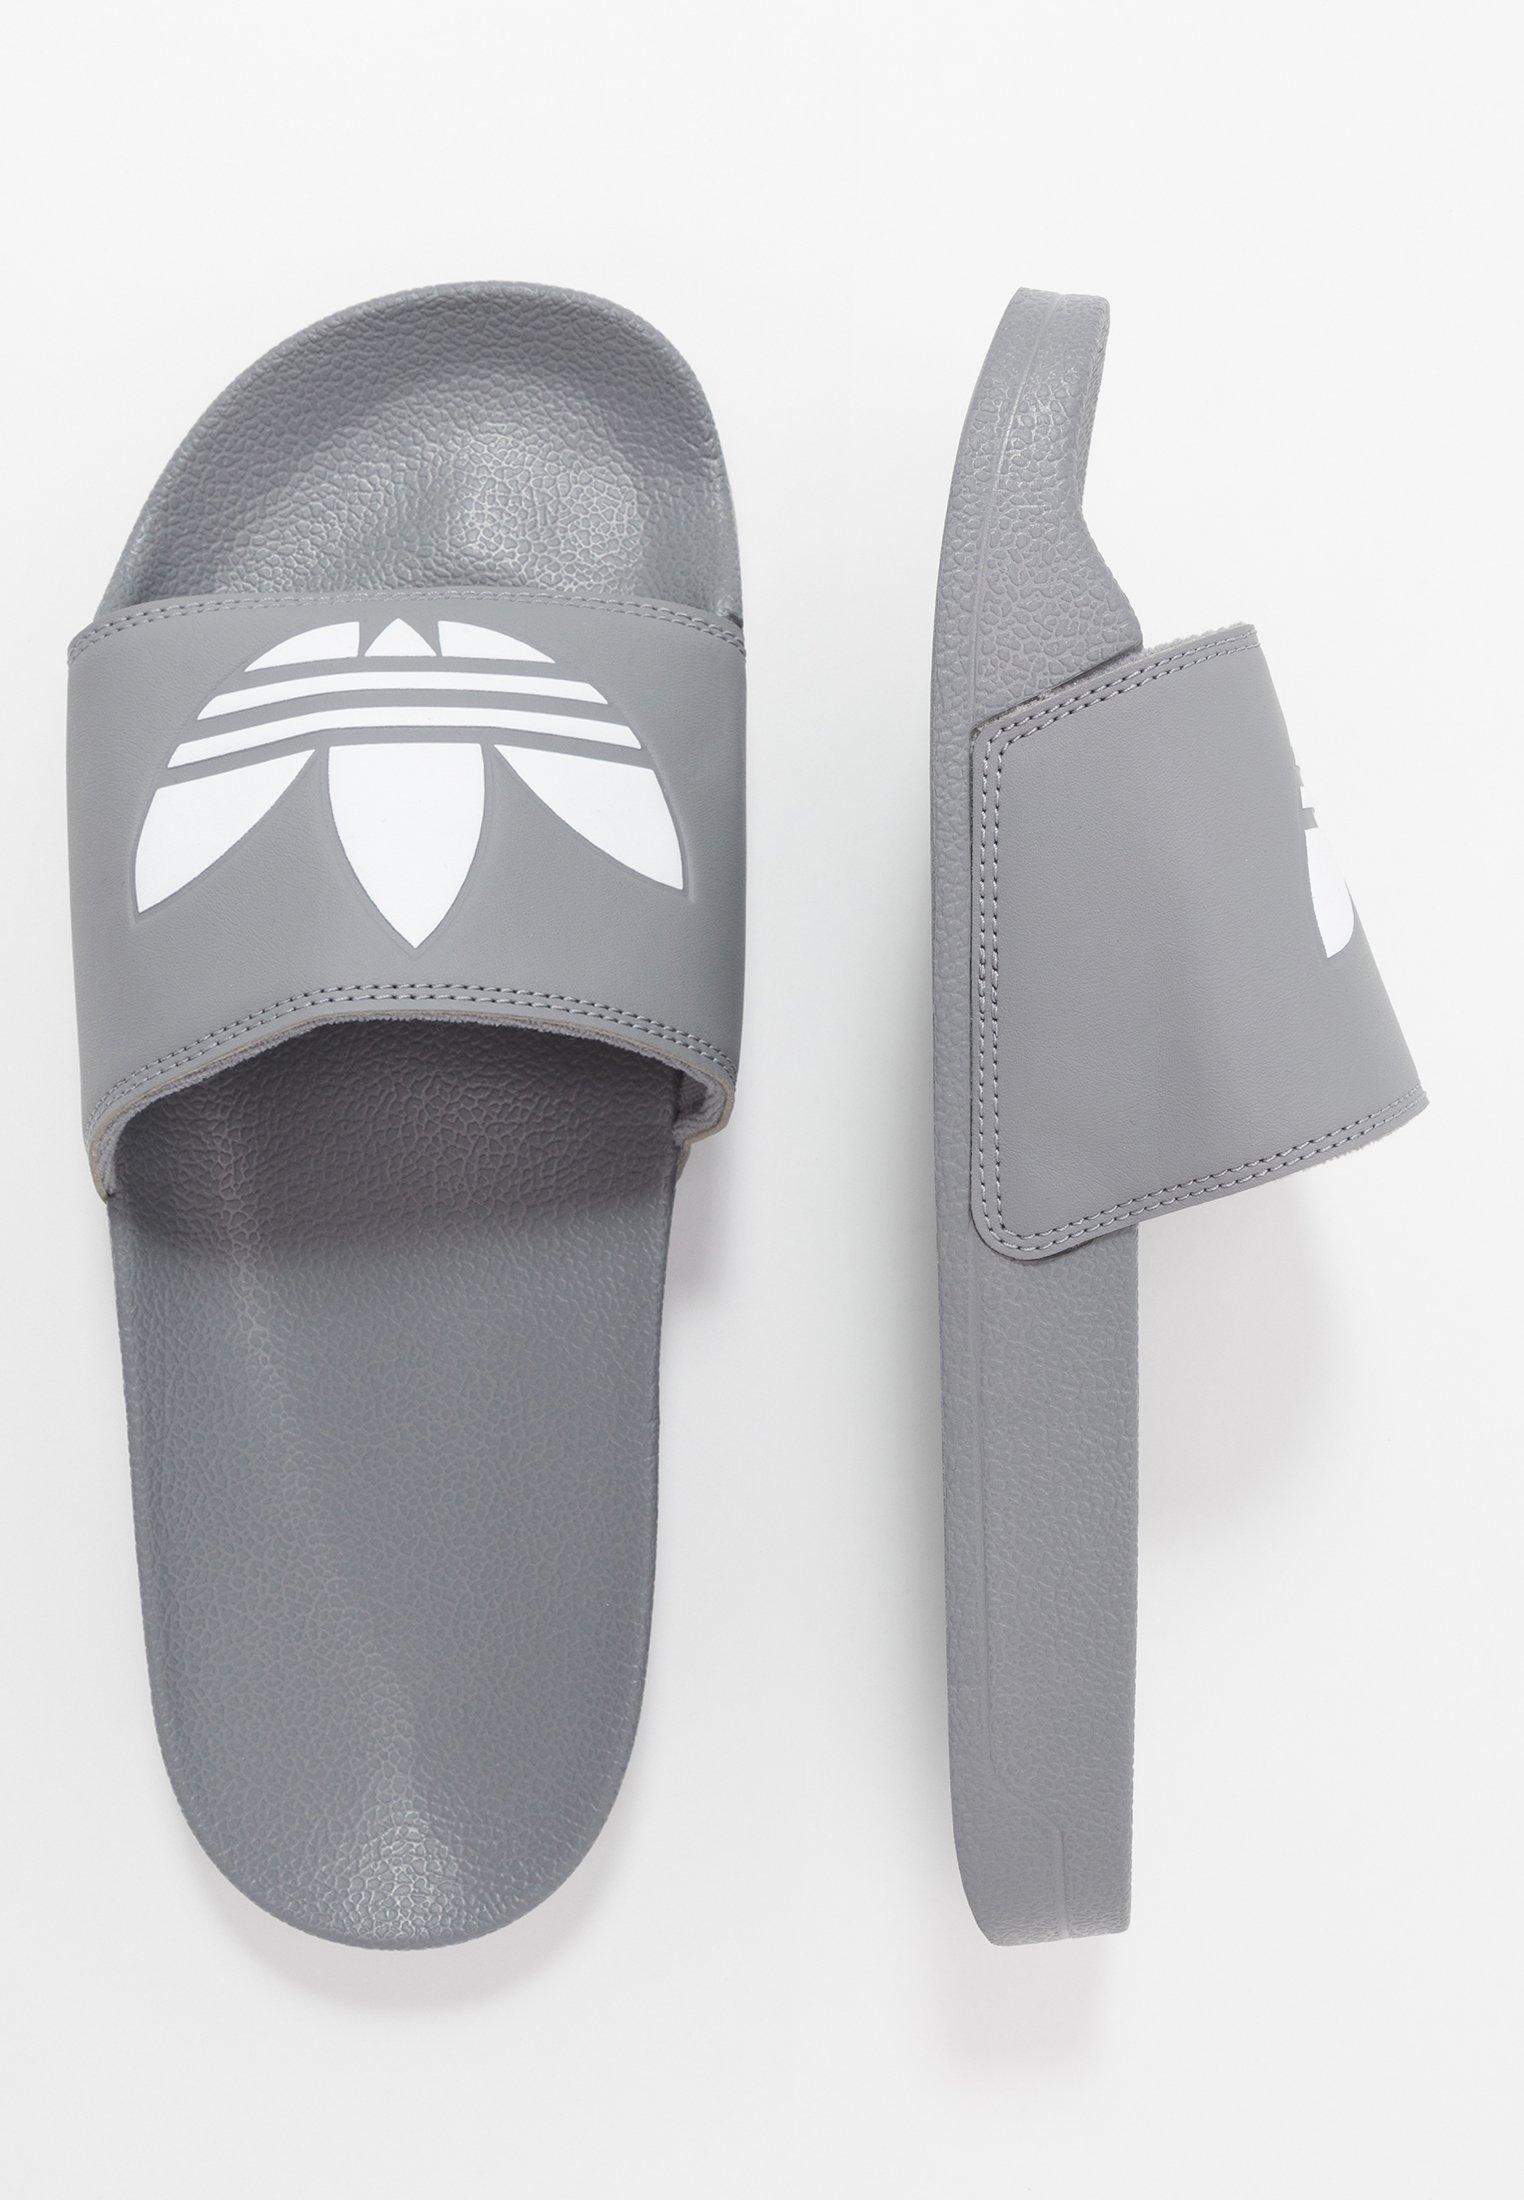 adidas original adilette mule